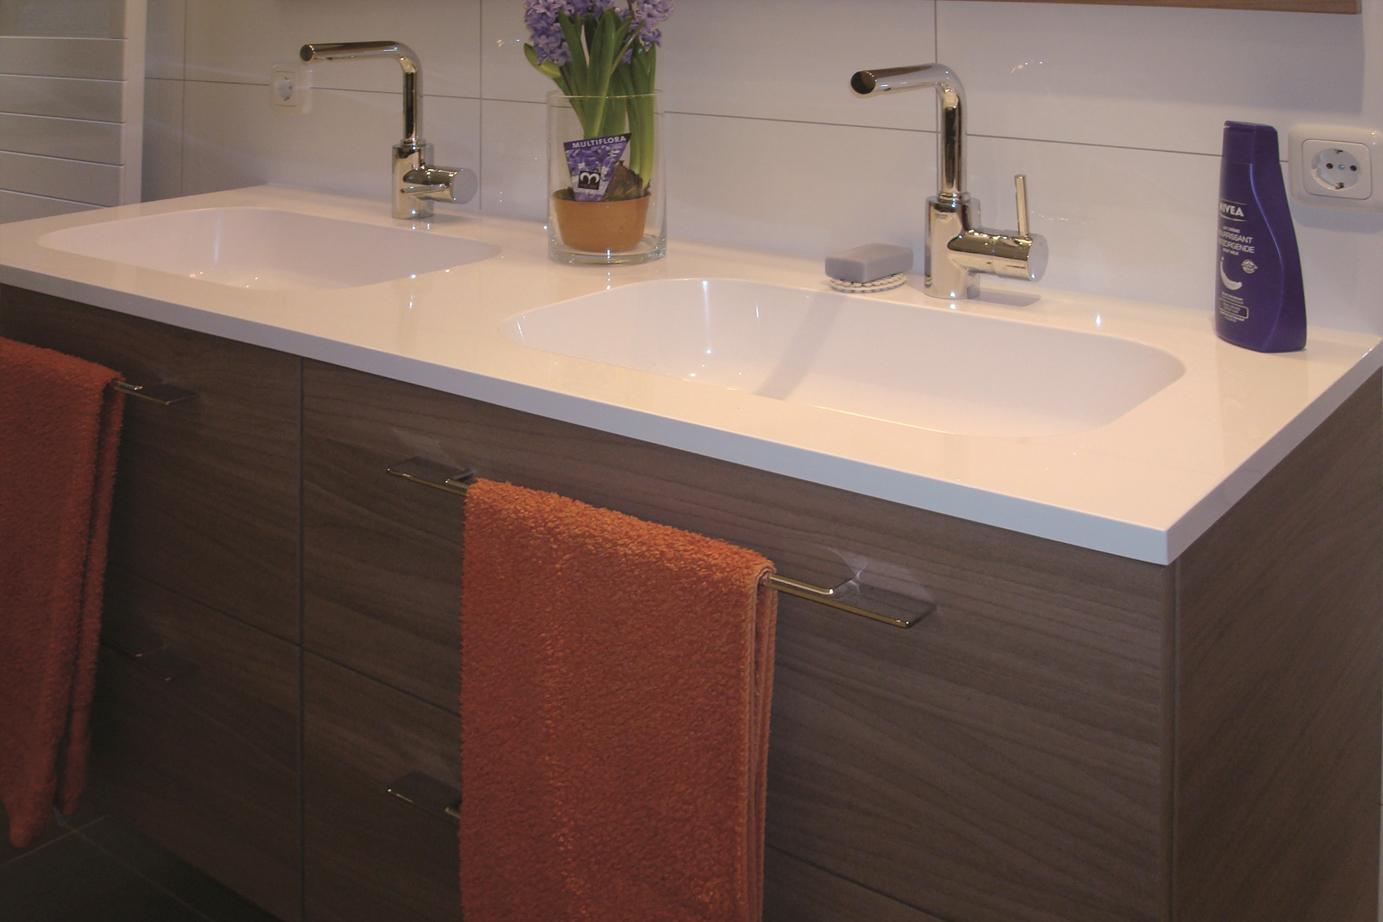 Tegels badkamer vervangen kosten tegelzetter een overzicht tegelzetter badkamer - Tegellijm keuken ...